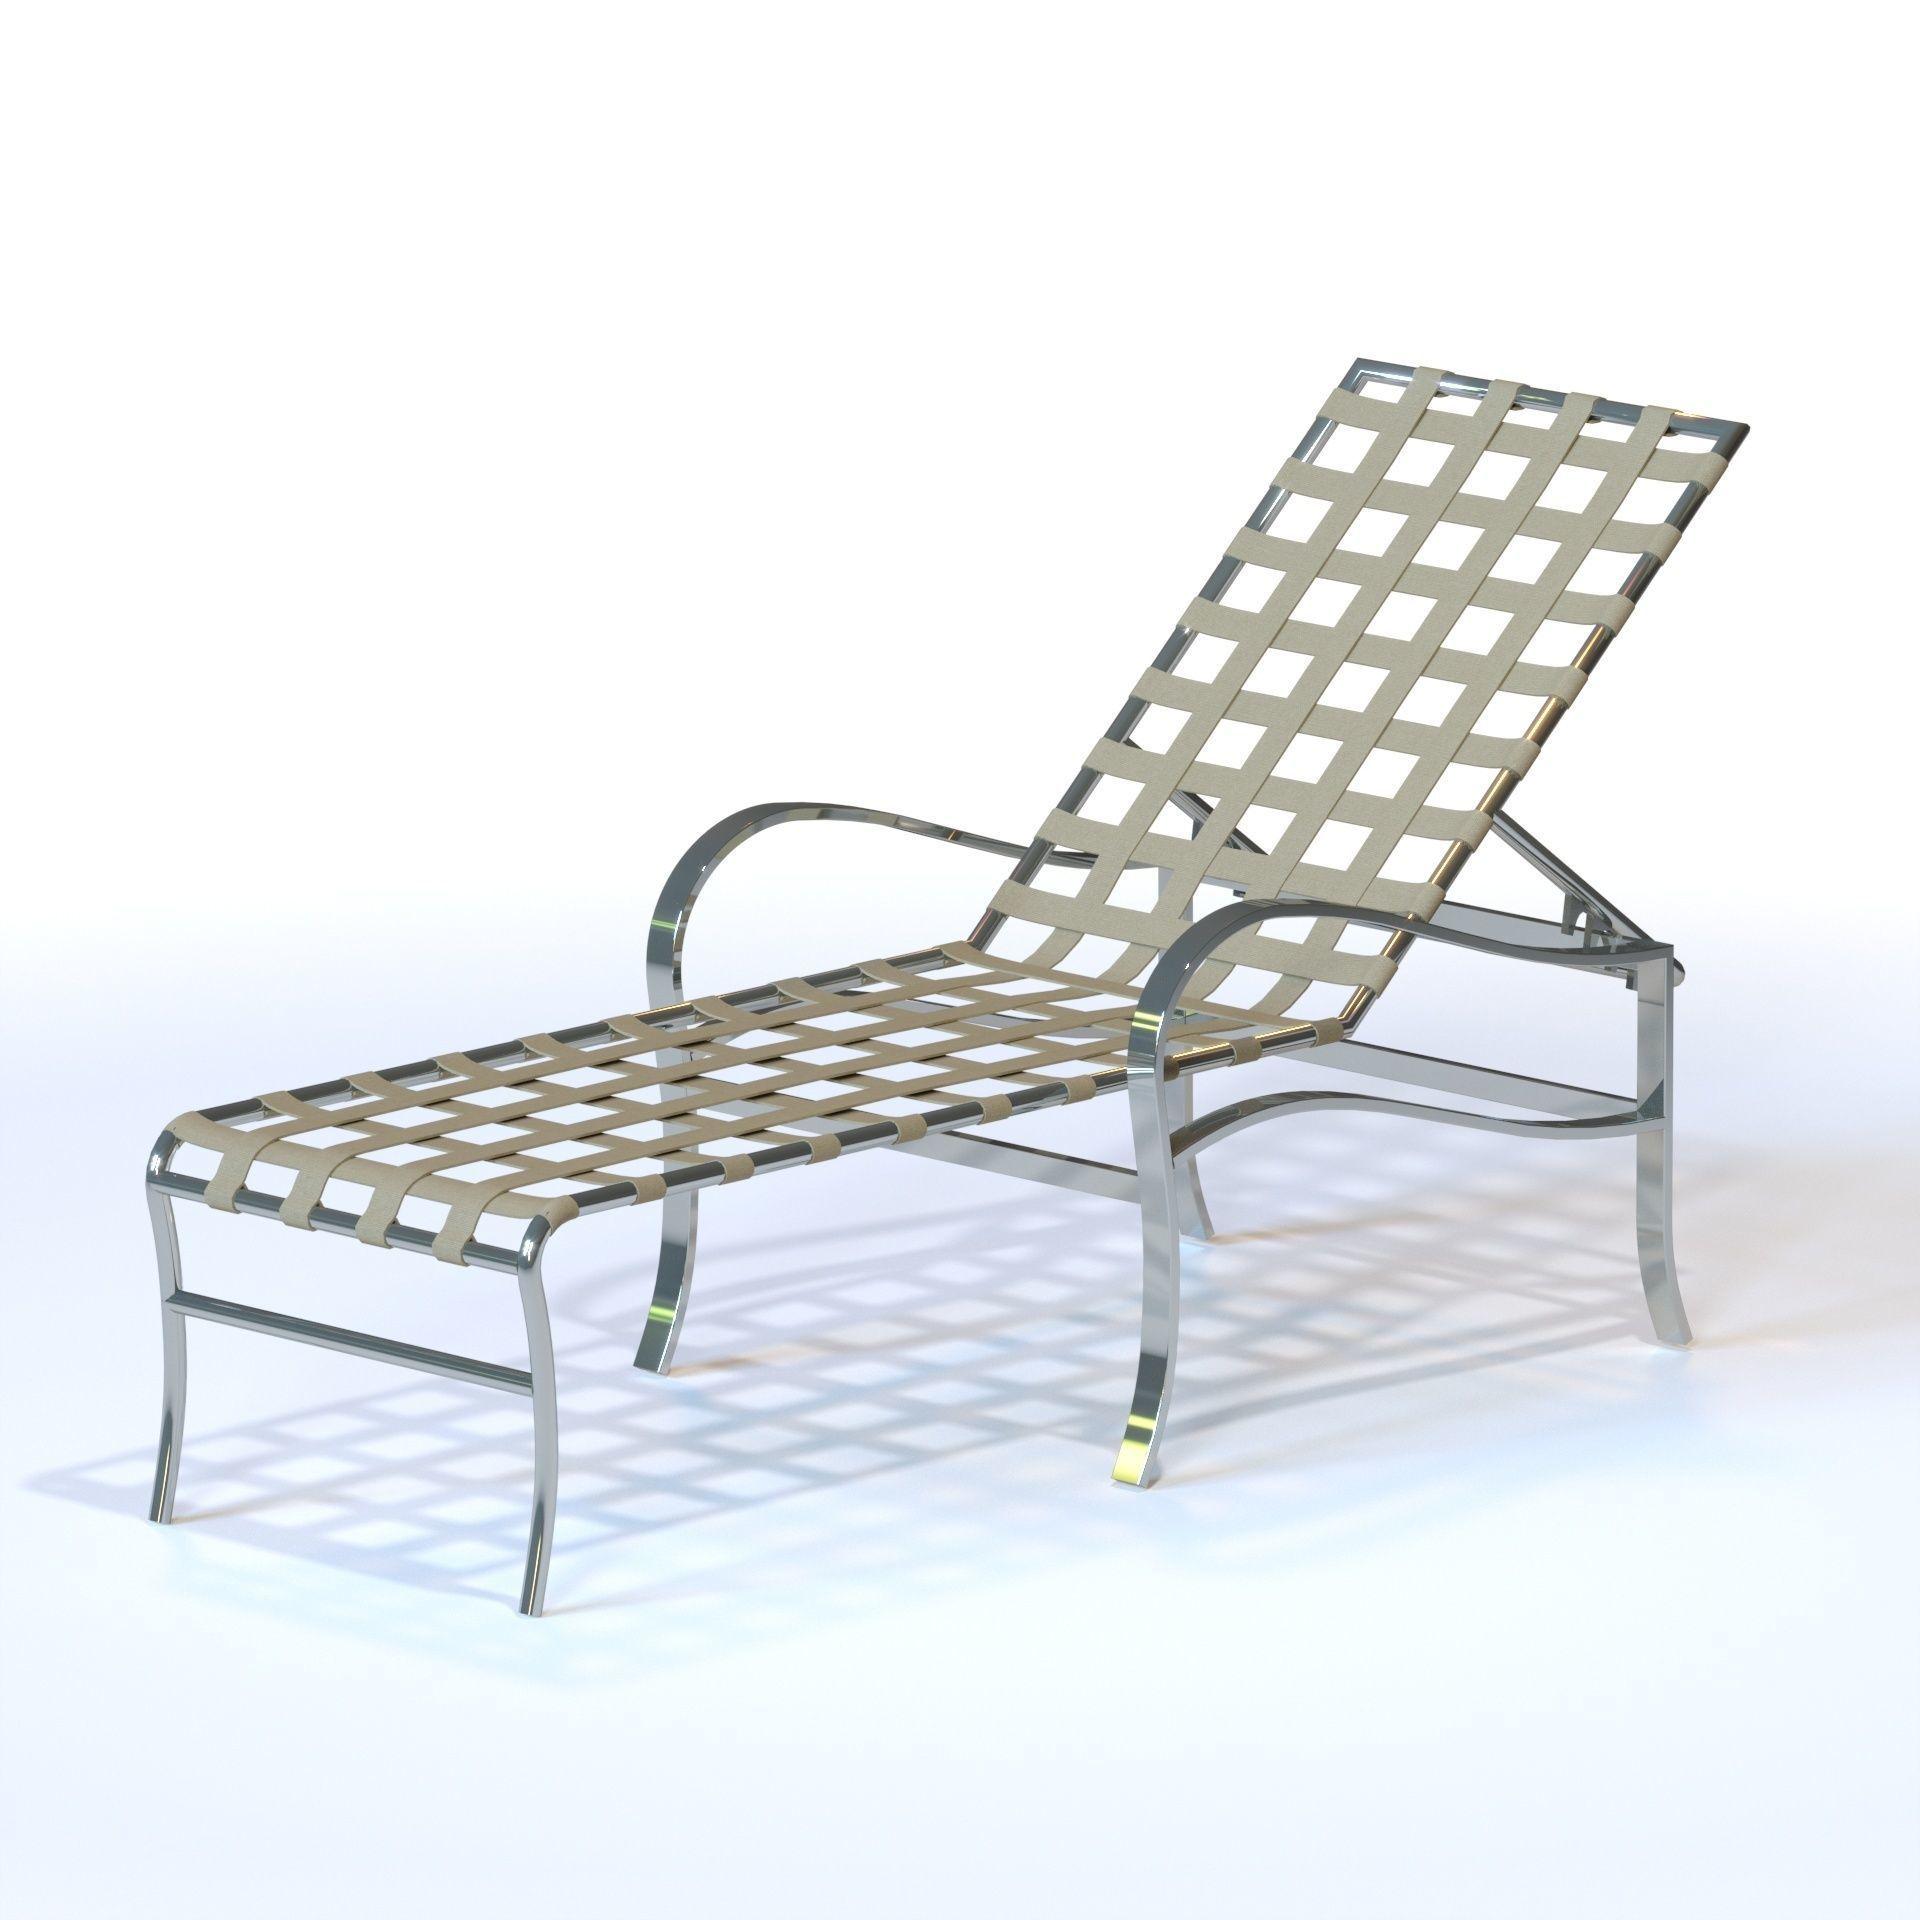 Strange Tropitone By Casual Living Palladian Strap Chaise Lounge 3D Model Interior Design Ideas Helimdqseriescom